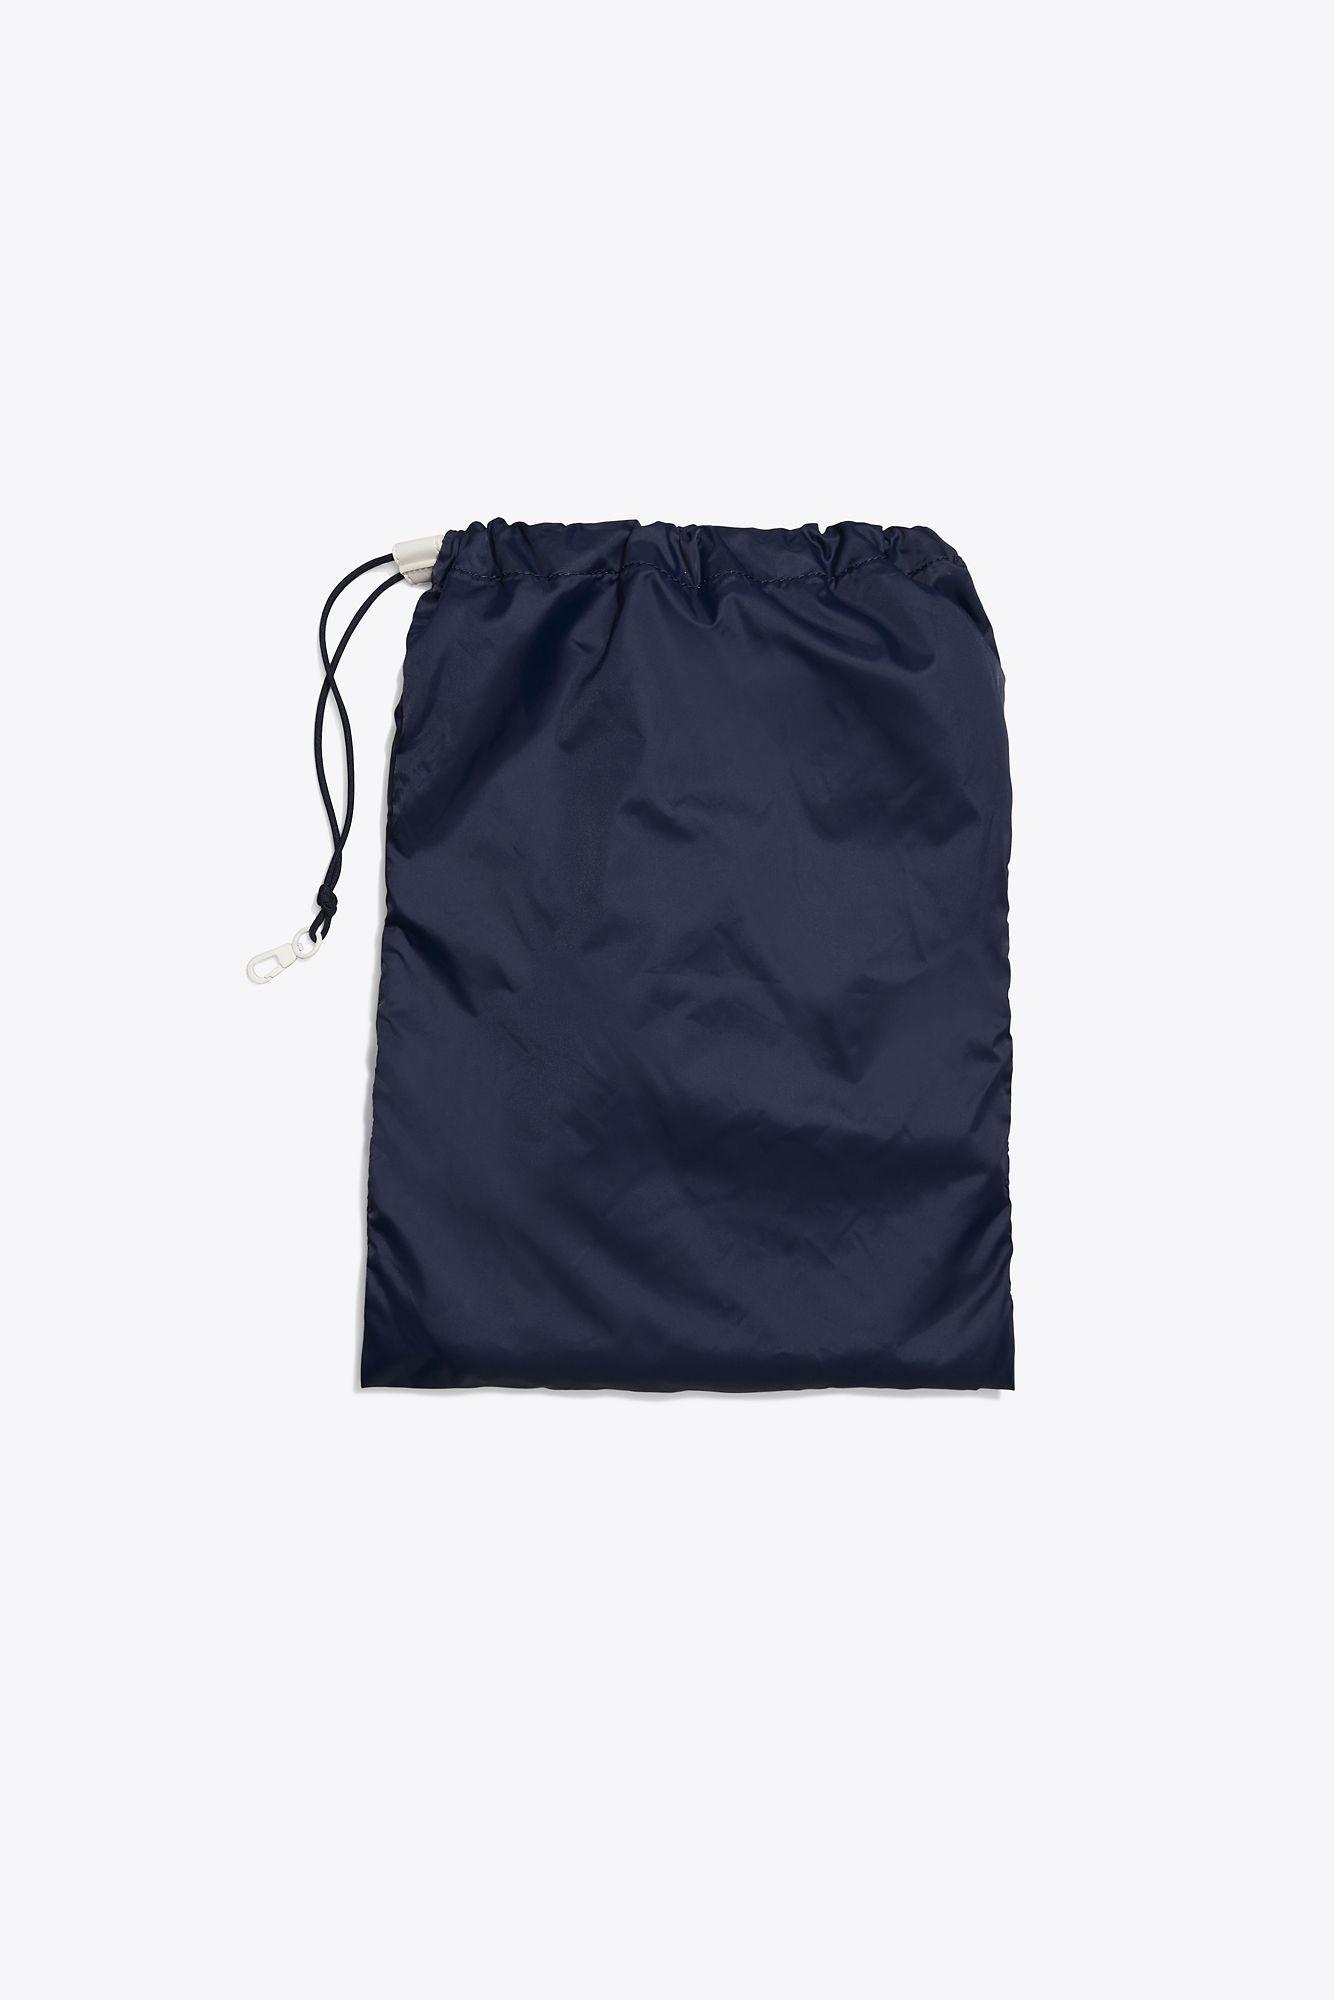 Tory Burch Multicolor Canvas Weekender Duffle Bag Lyst View Fullscreen